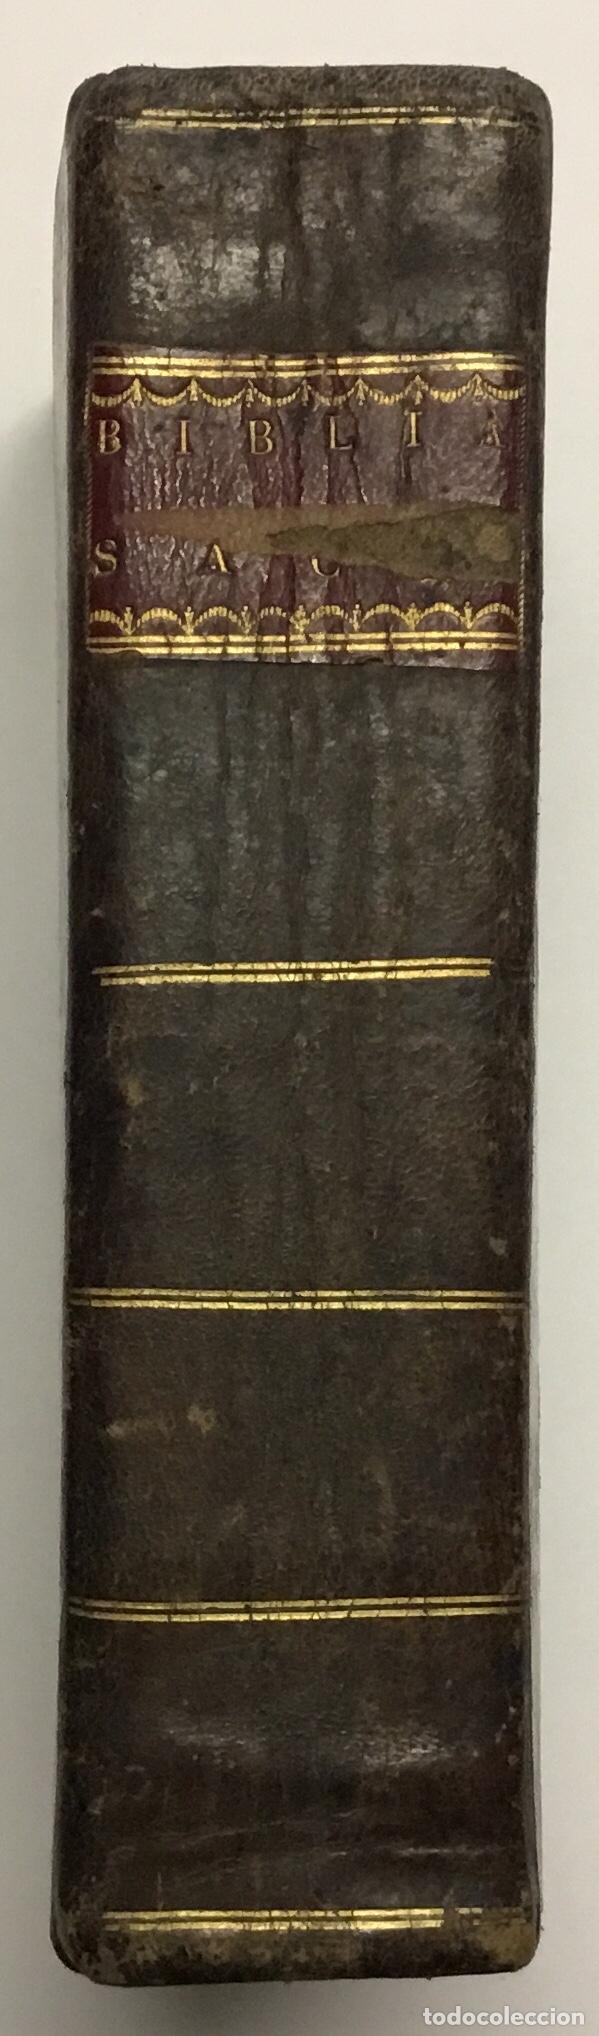 Libros antiguos: BIBLIA SACRA VULGATAE EDITIONIS, SIXTI V. ET CLEMENTIS VIII. - Foto 4 - 123139907